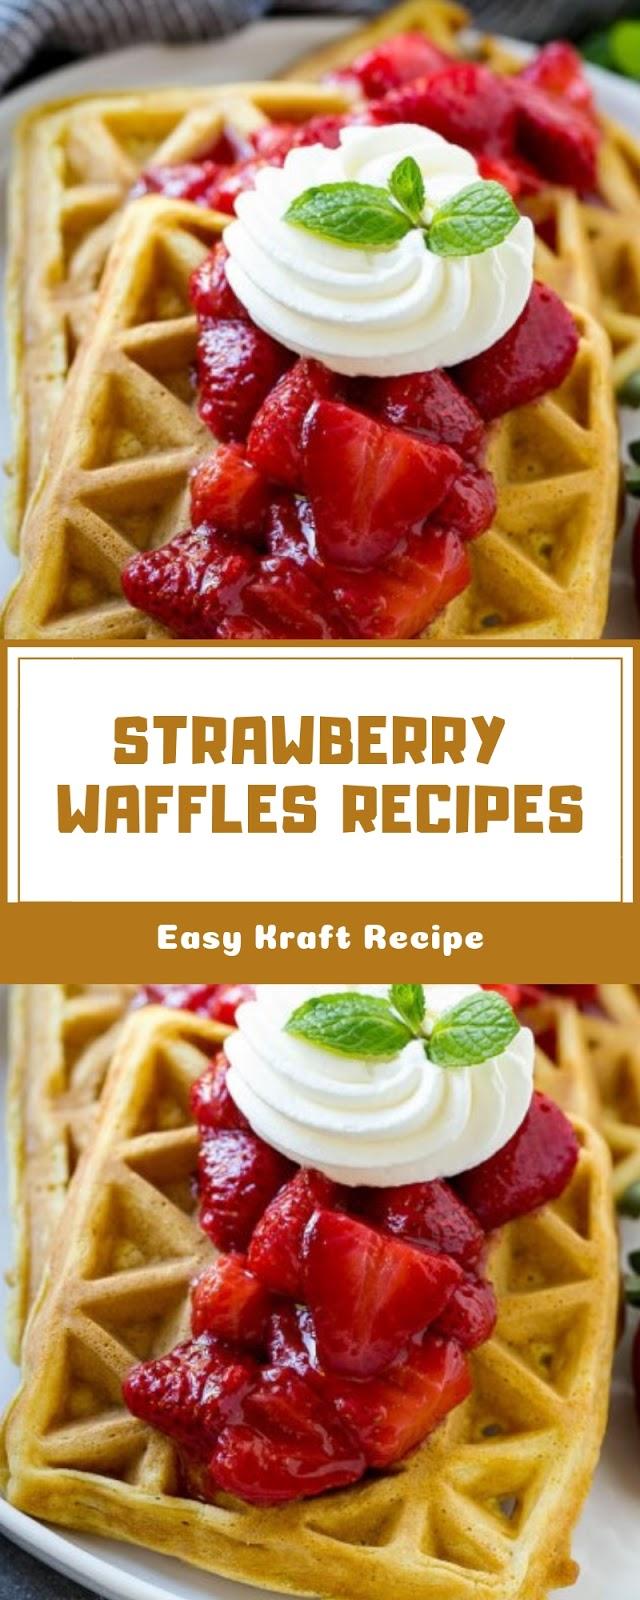 STRAWBERRY WAFFLES RECIPES